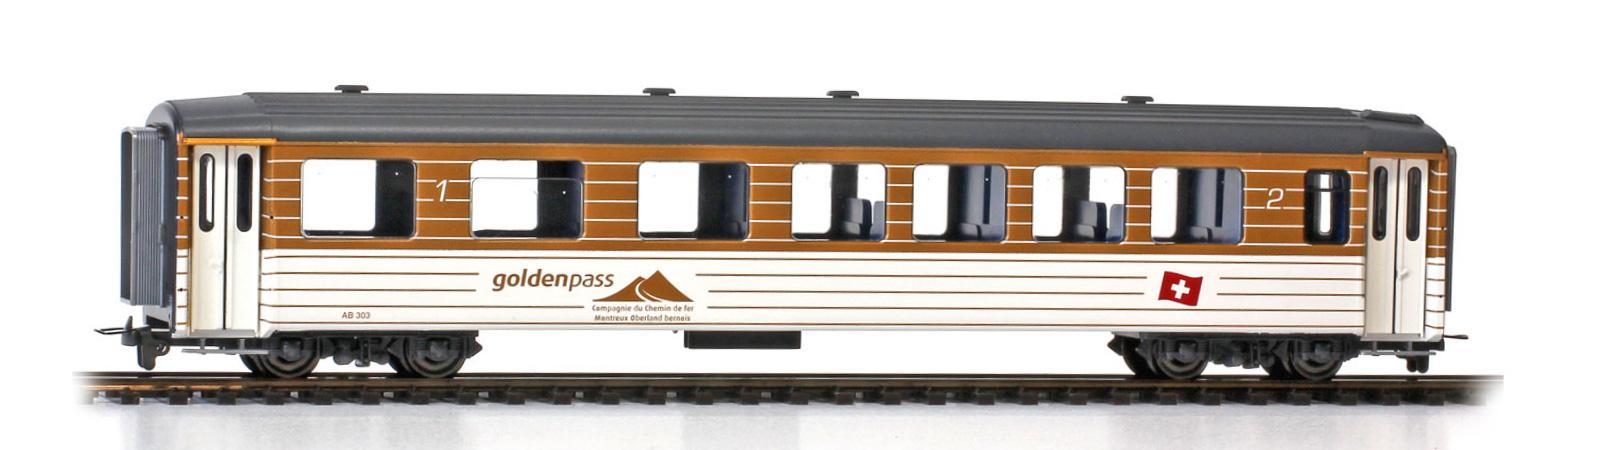 "3291343 MOB AB 303 Personenwagen ""goldenpass""-1"